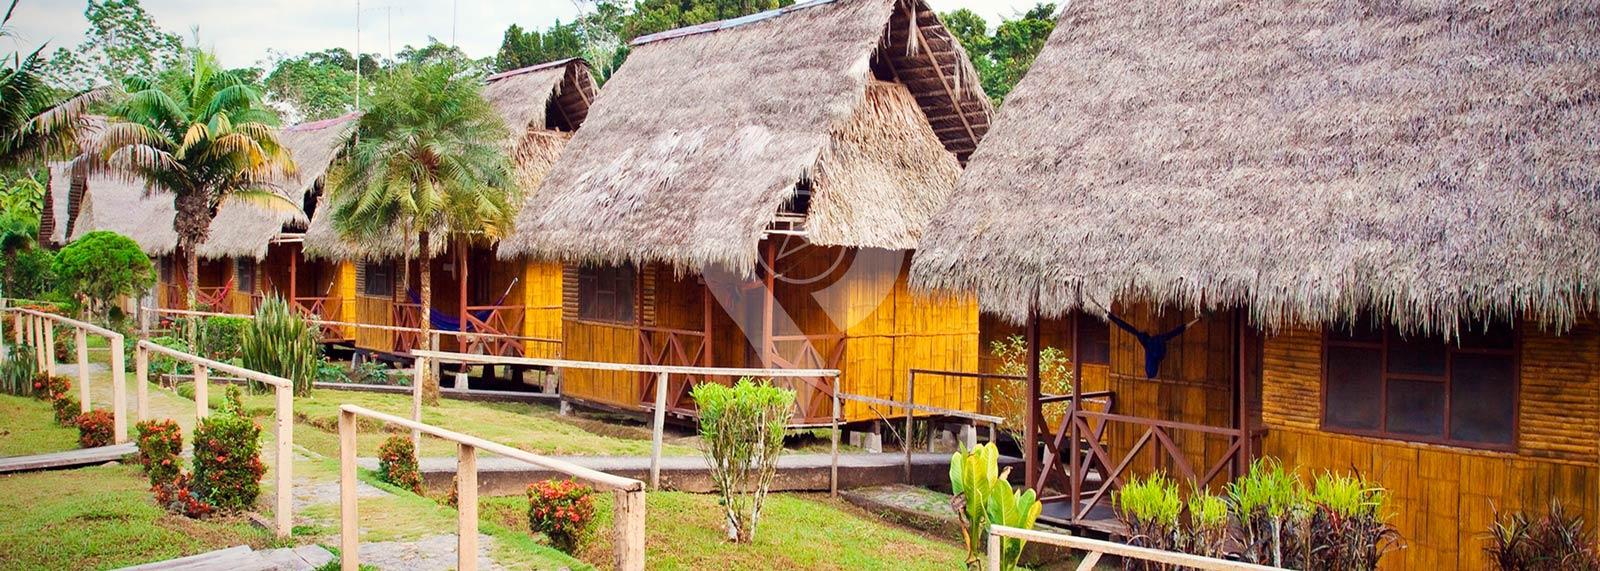 Yarina Lodge